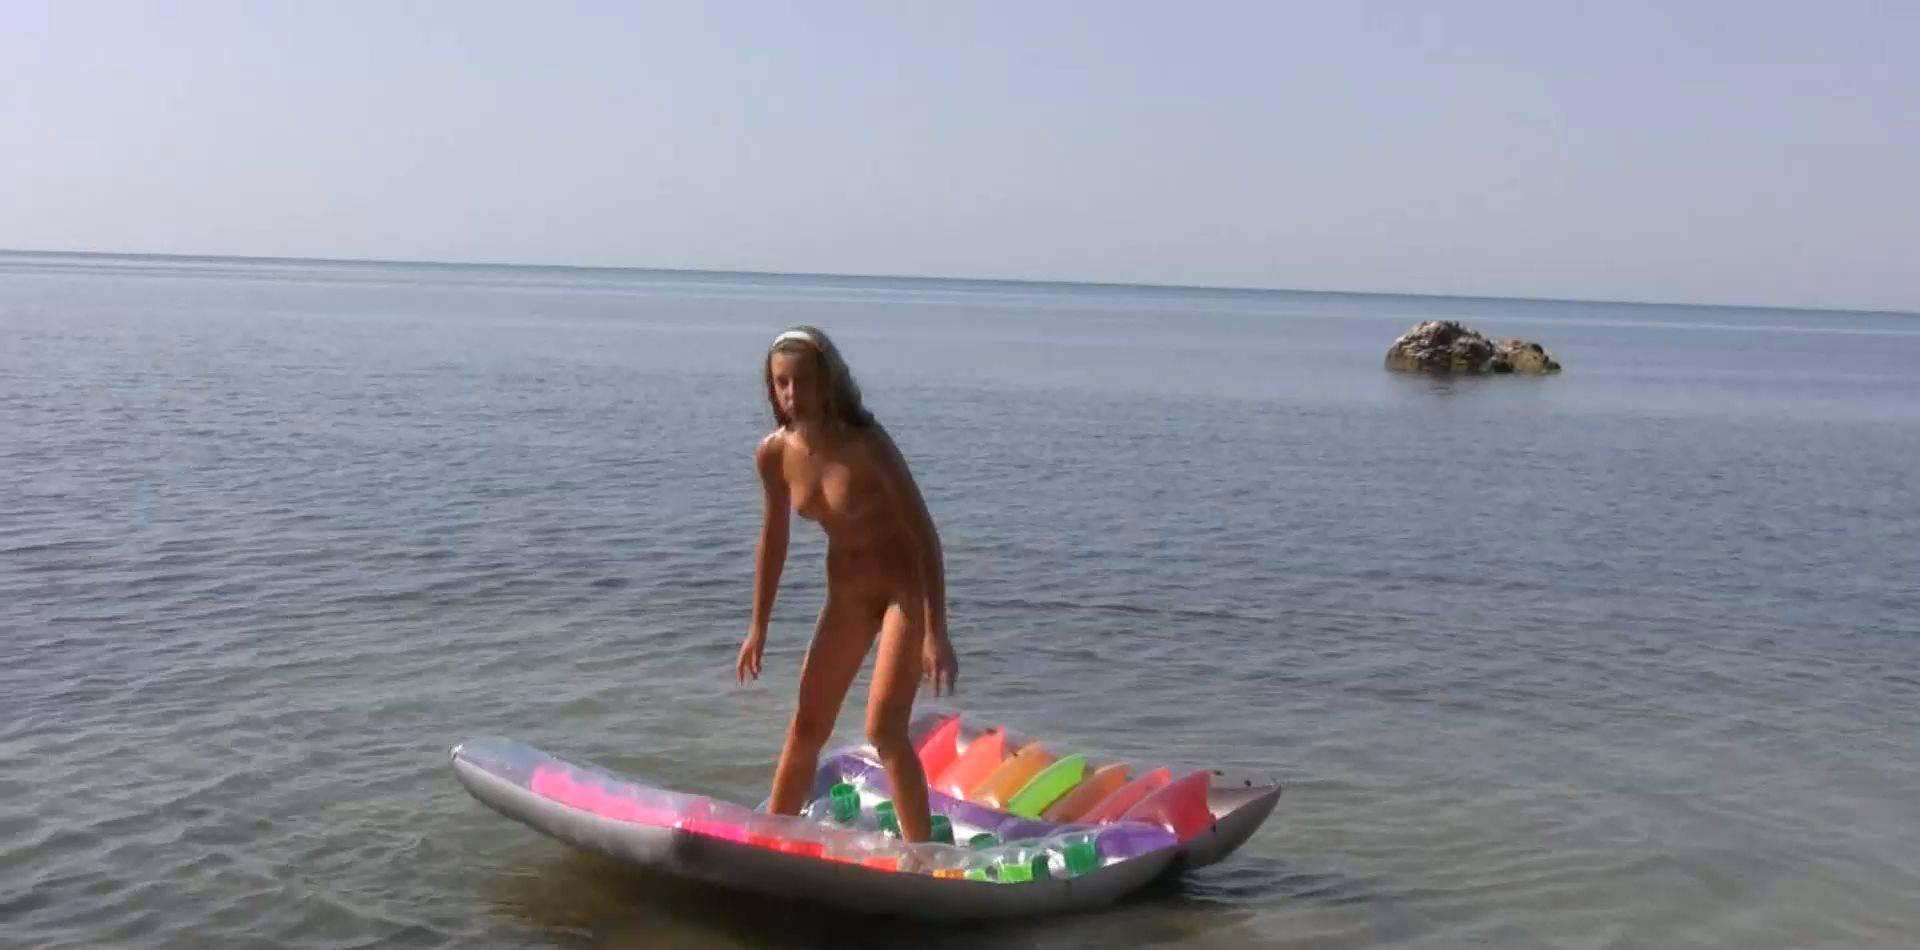 Nudist Girlfriends on Holiday 1 - 1